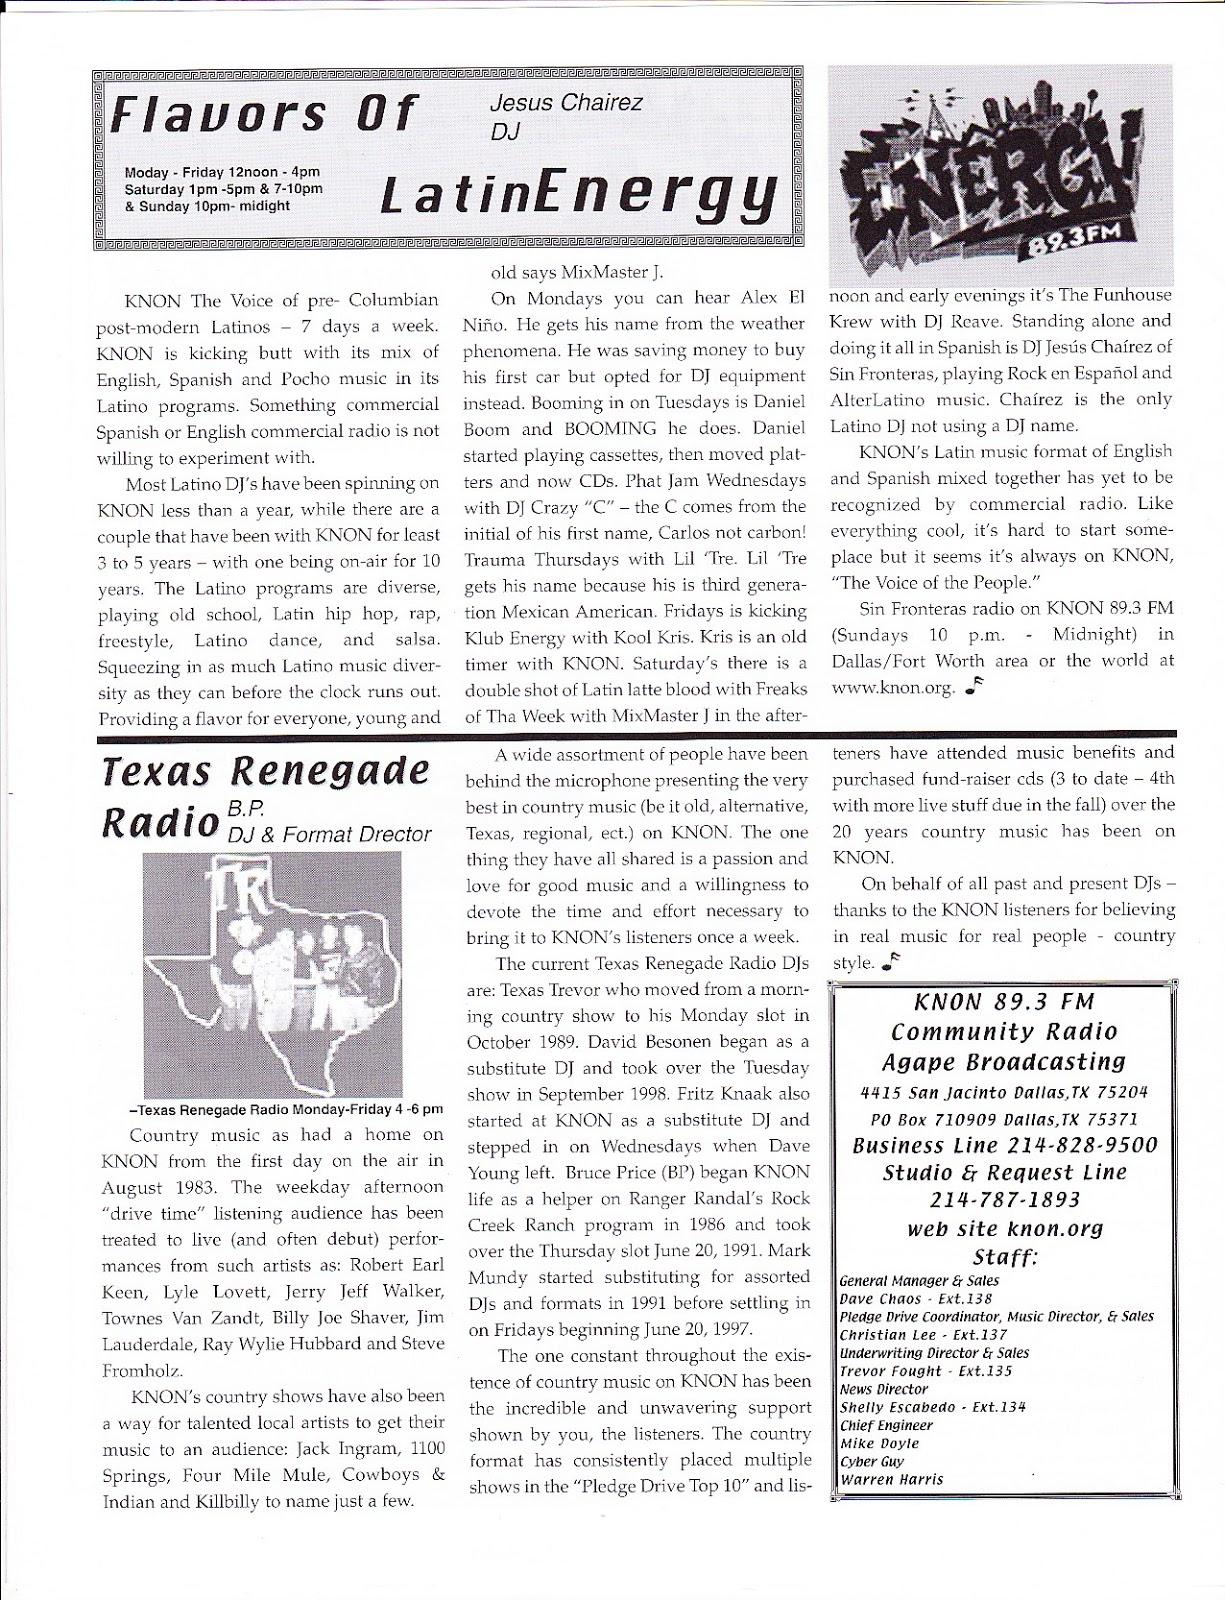 knon-quarterly-august-2003-p2